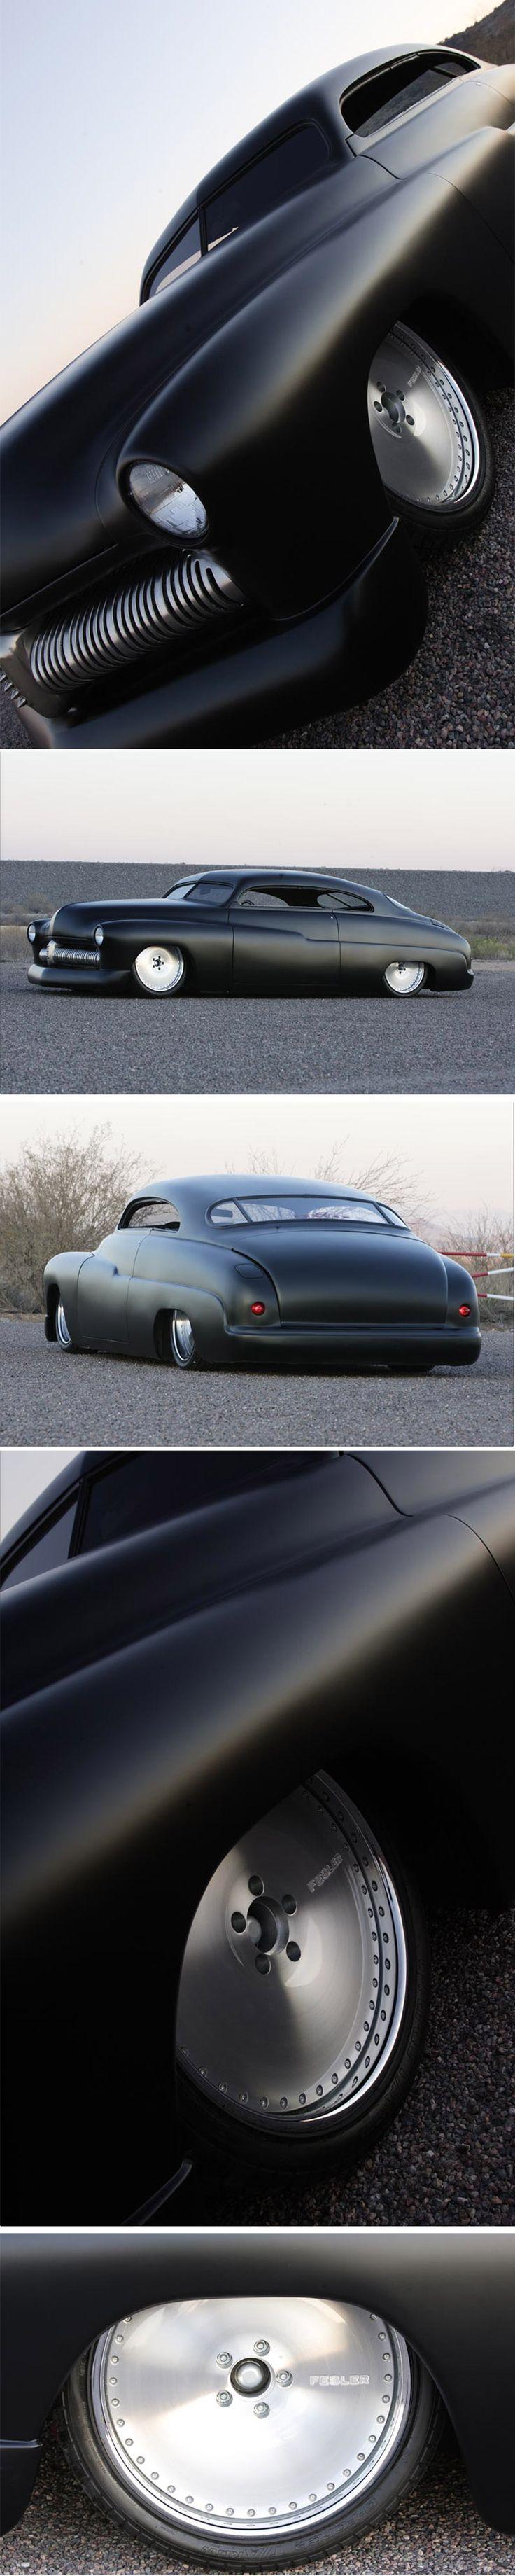 "phantom ride | 1949 Merc ""Led Sled"" 1 day a matte black hotrod"